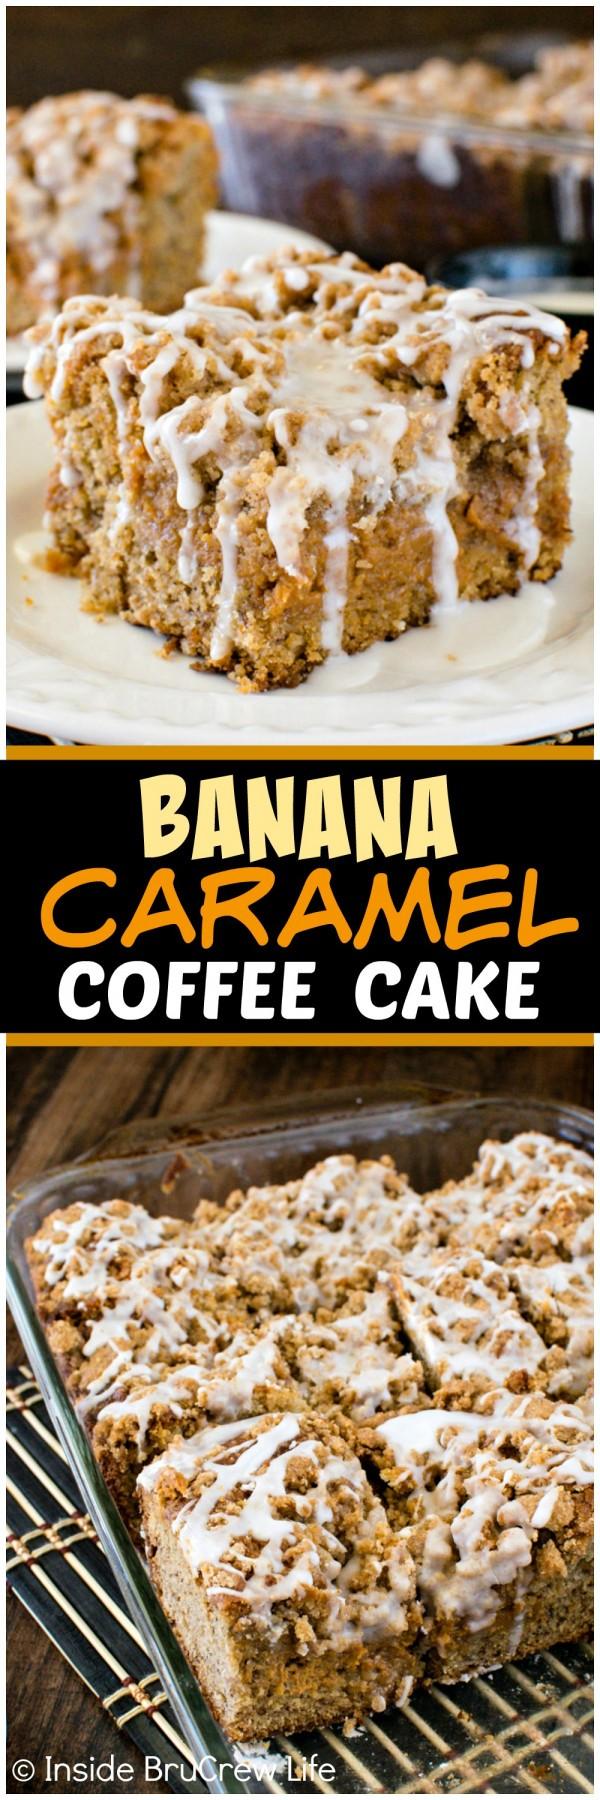 Banana Caramel Coffee Cake - lots of crumbs, glaze, and caramel cheesecake layers make this the best banana cake. Great breakfast or dessert recipe!